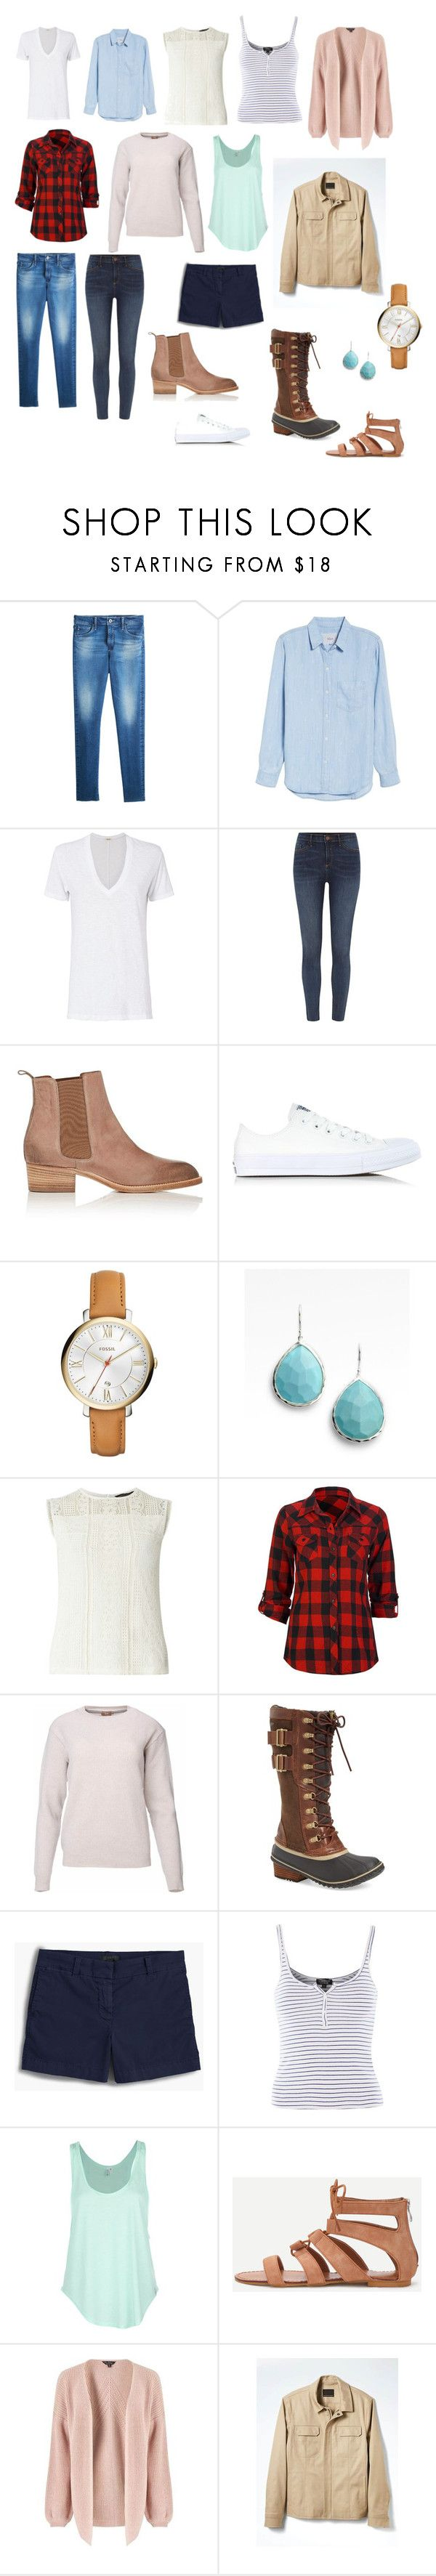 """Year-round SAHM minimalist wardrobe"" by cheryl-eisenschmid on Polyvore featuring AG Adriano Goldschmied, Rails, Monrow, River Island, Sartore, Converse, FOSSIL, Ippolita, Dorothy Perkins and Full Tilt"